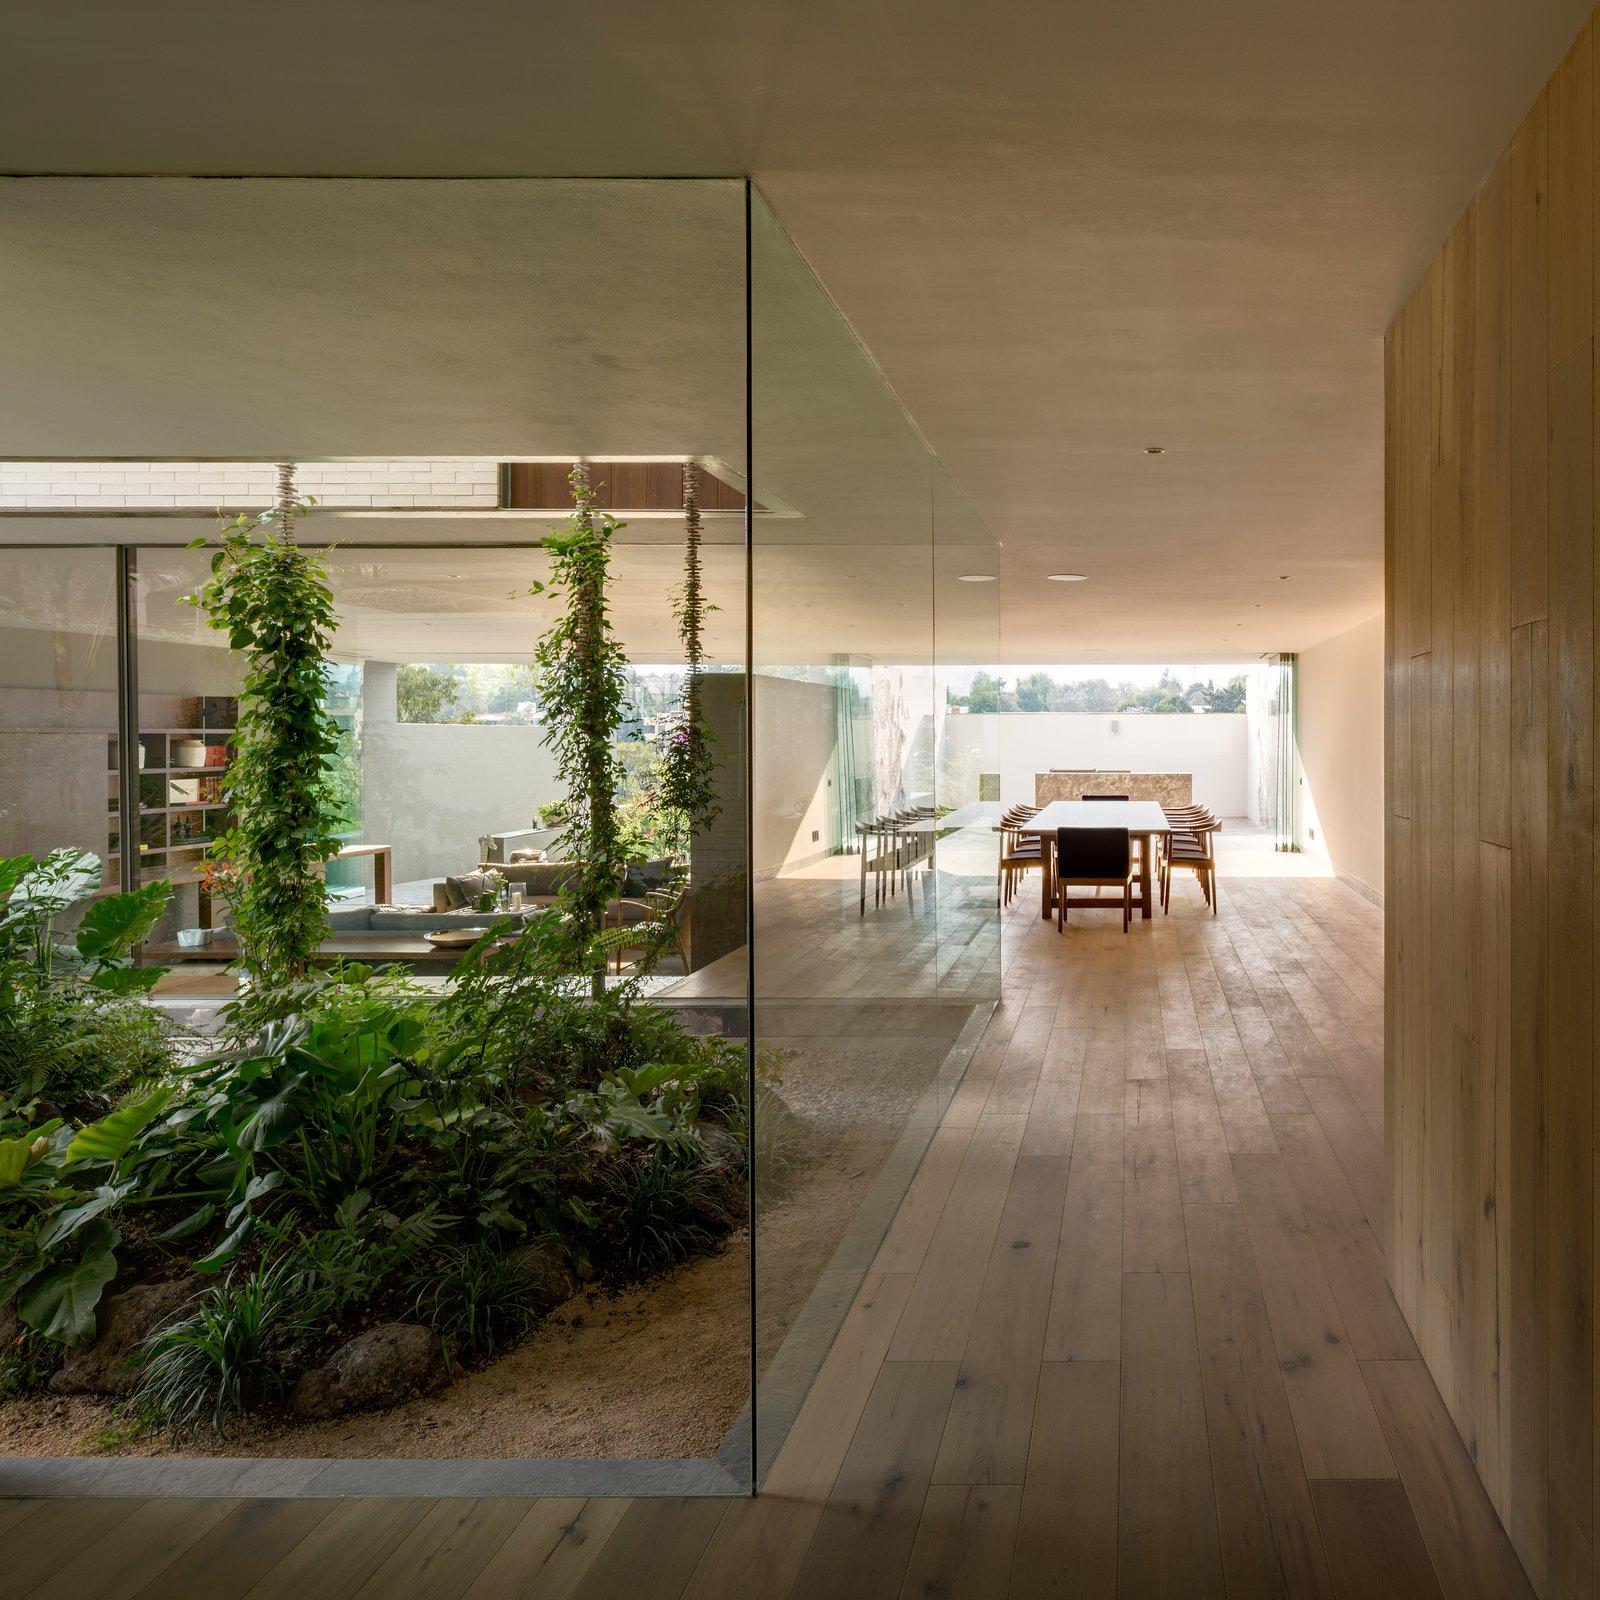 Hallway and Medium Hardwood Floor  Photo 20 of 20 in A Serene Home in Mexico Weaves Around Verdant Gardens